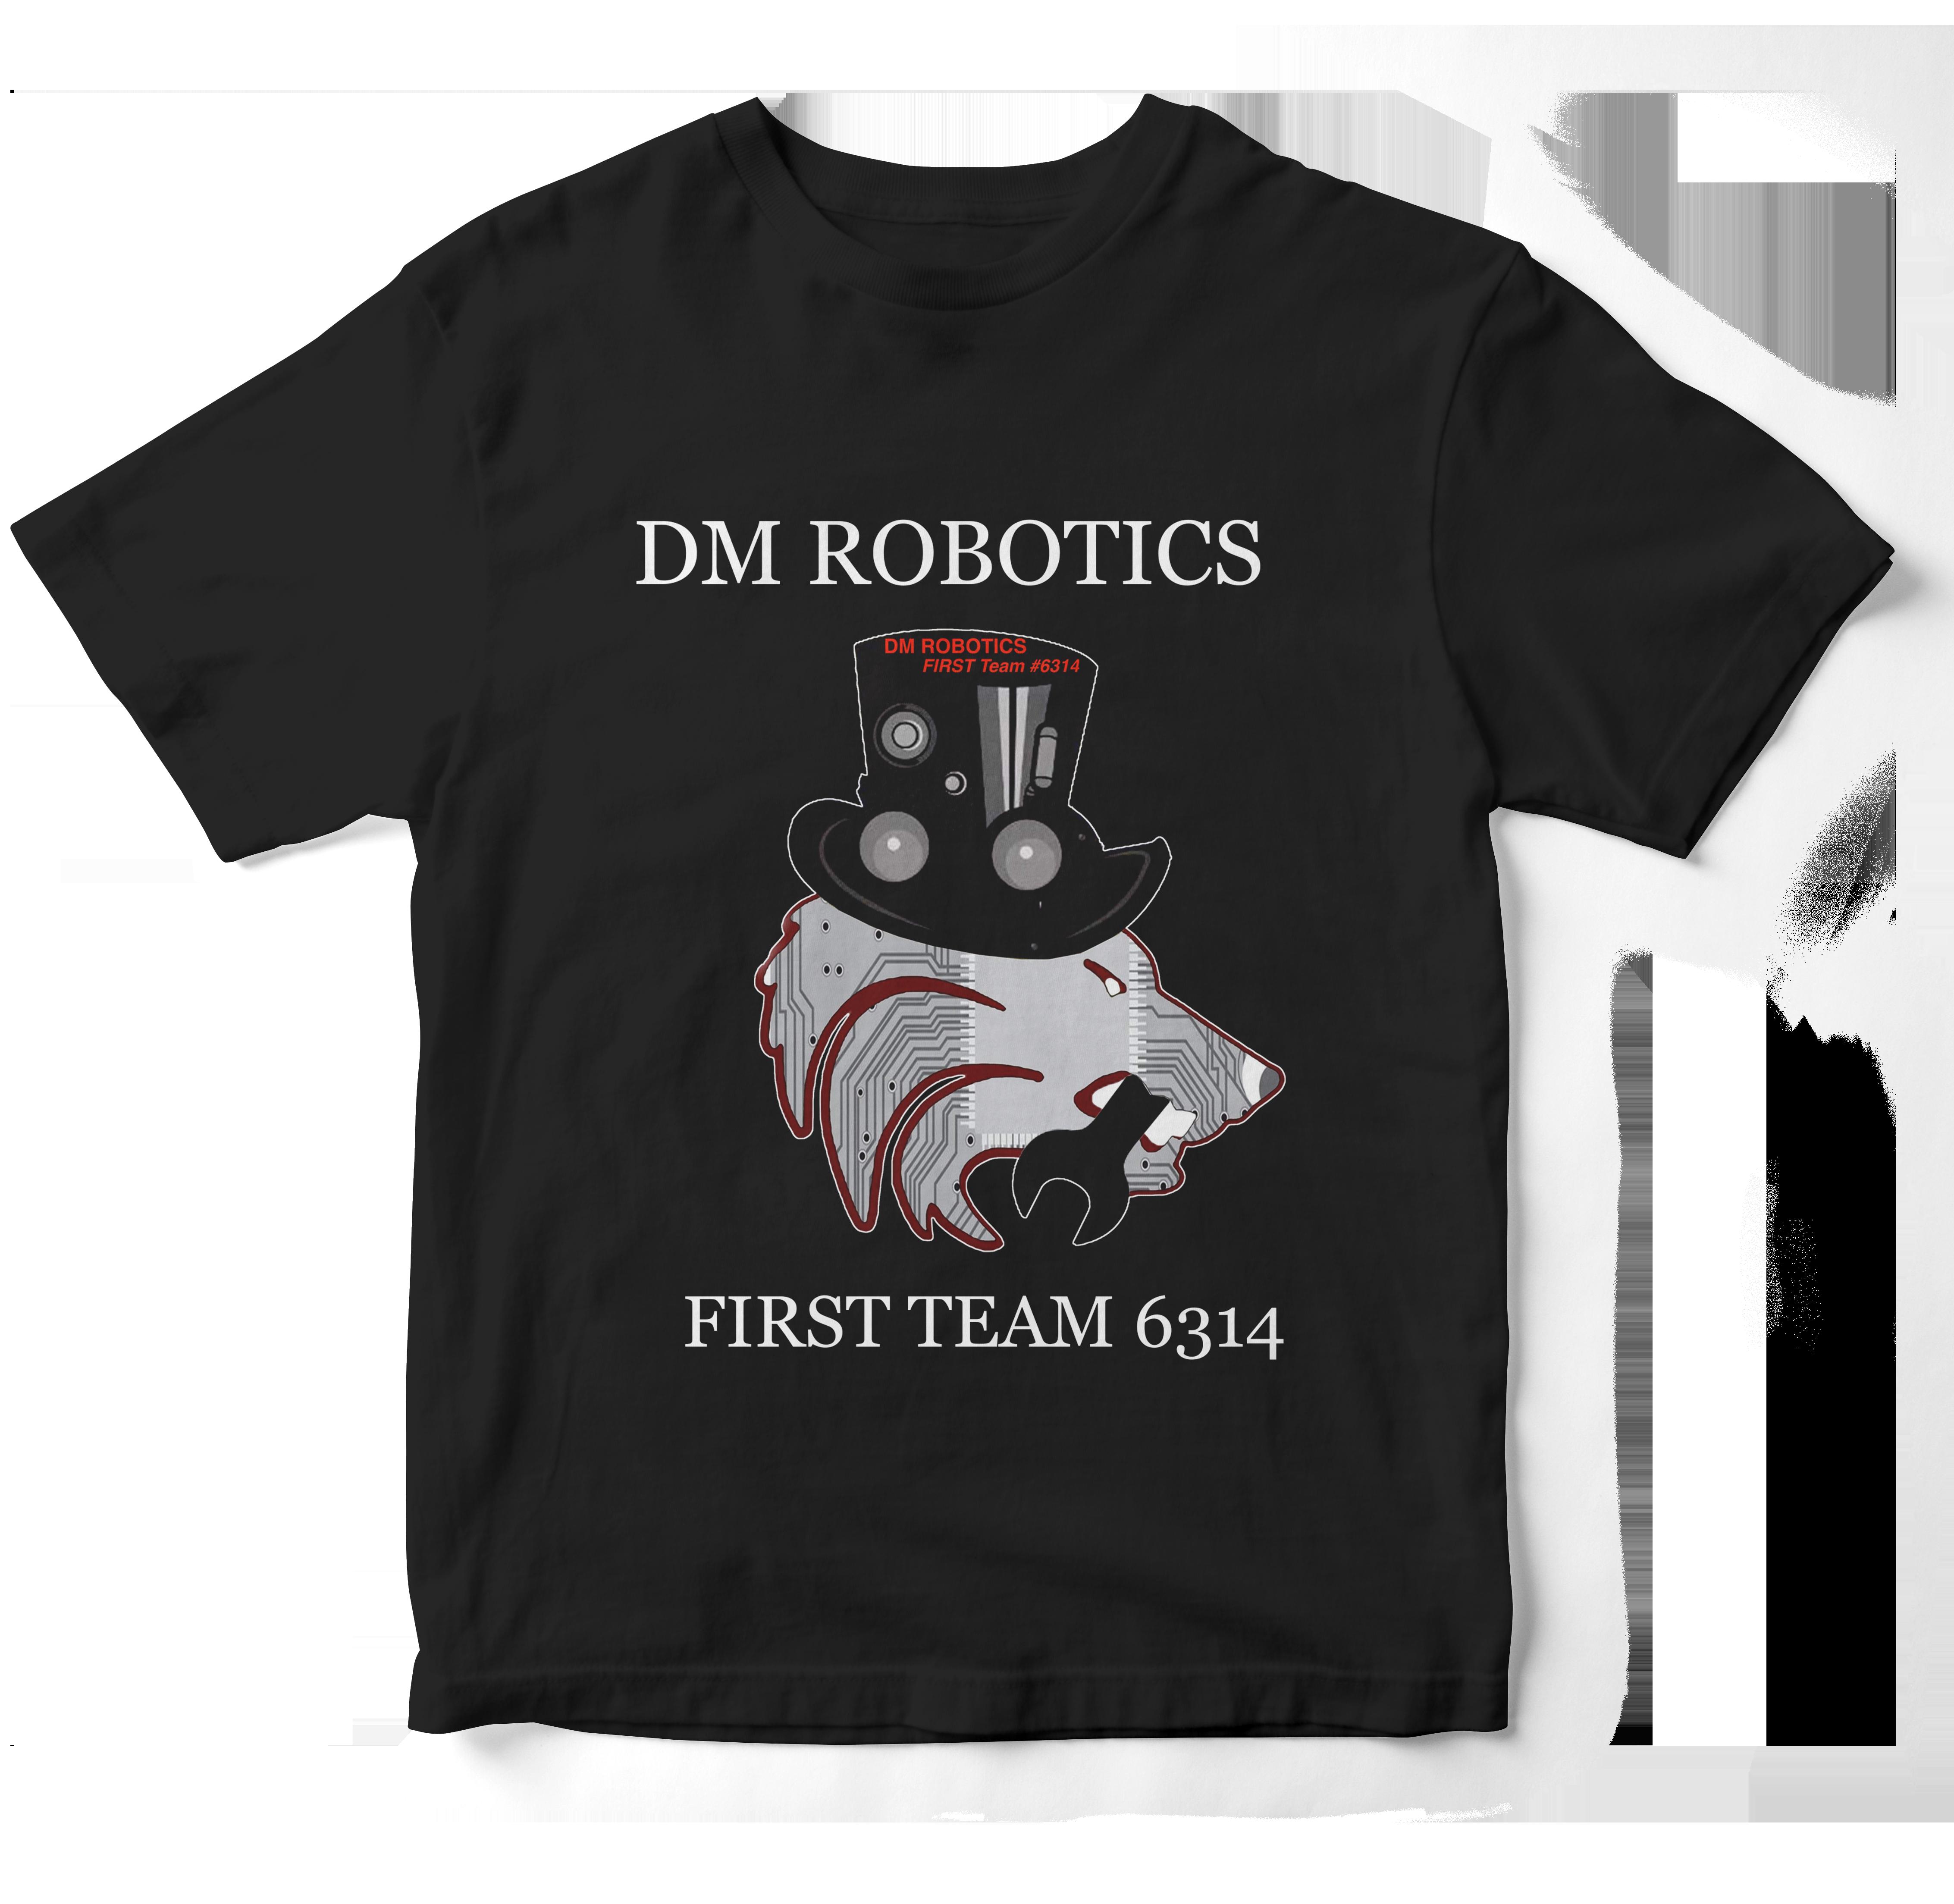 DM Robotics Wolpack Tshirt image